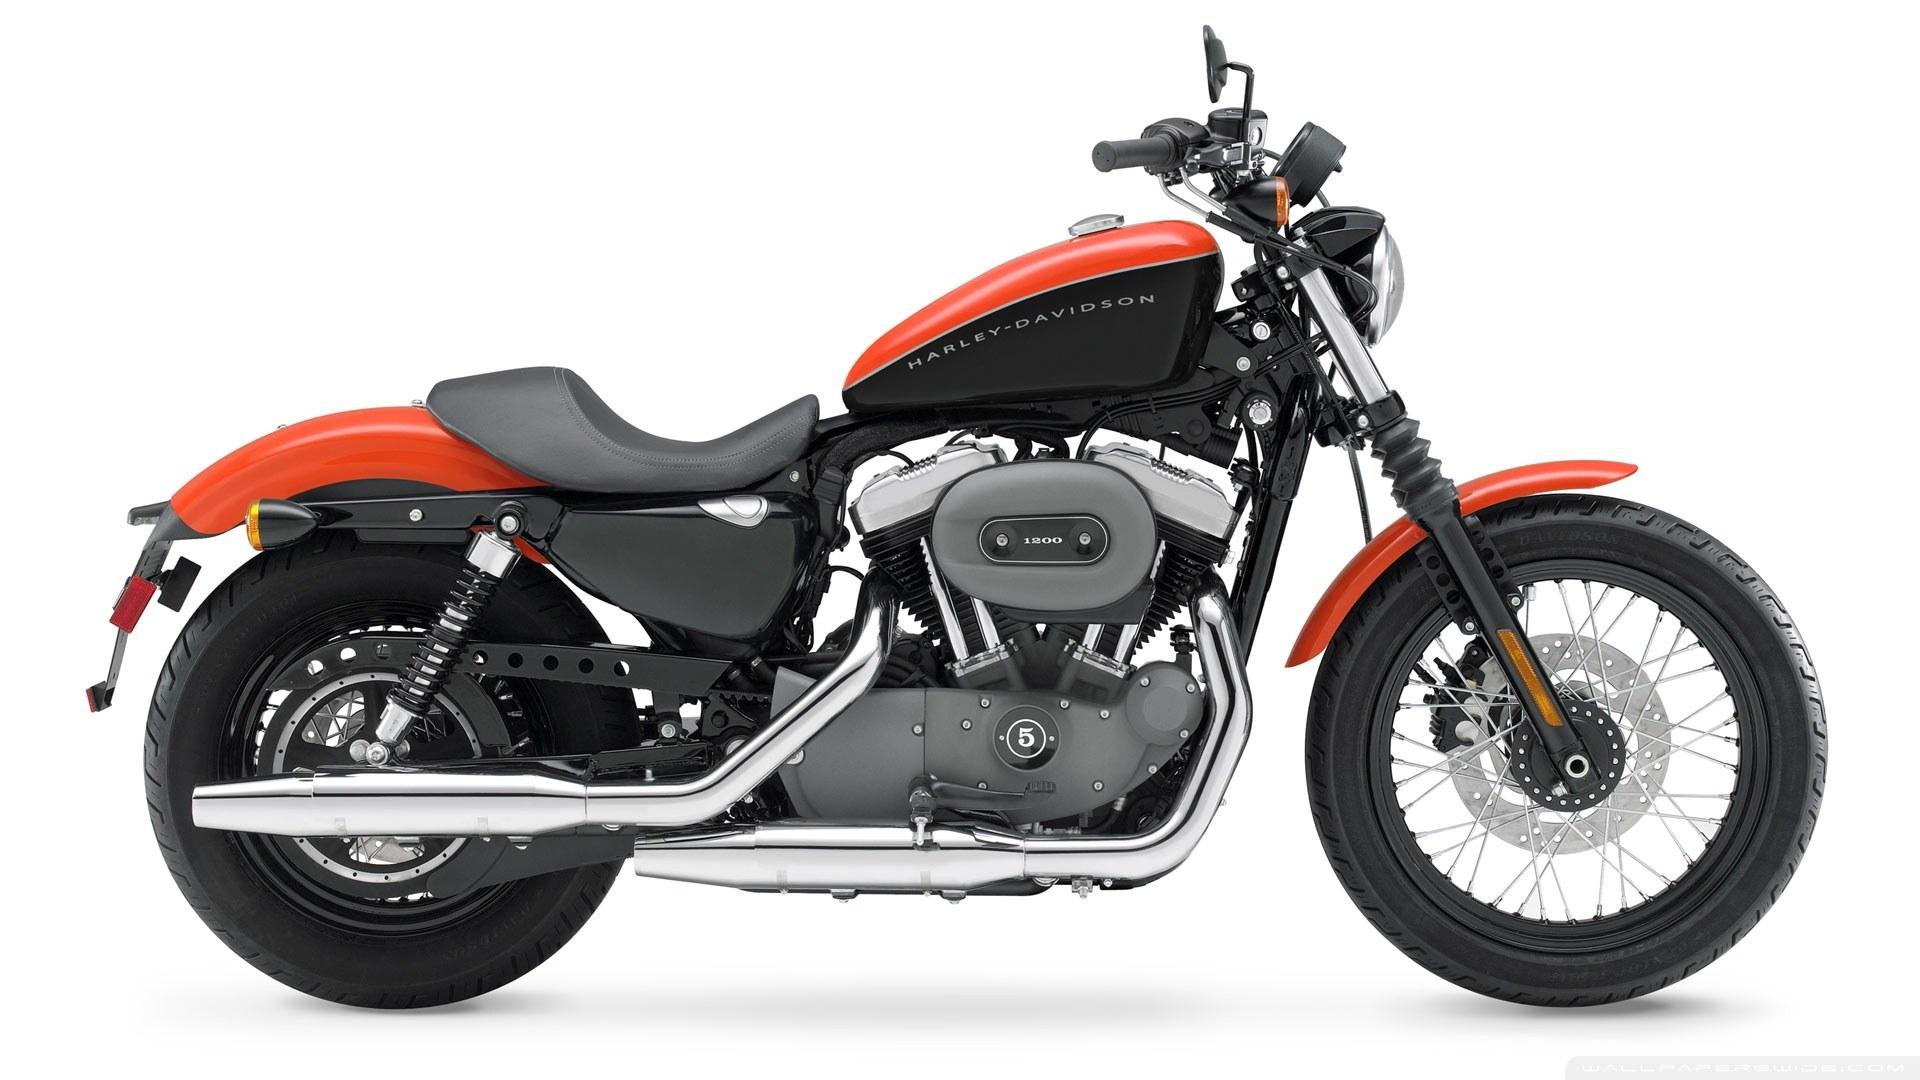 davidson bike harley wallpapers motorcycles bikes 1920x1080